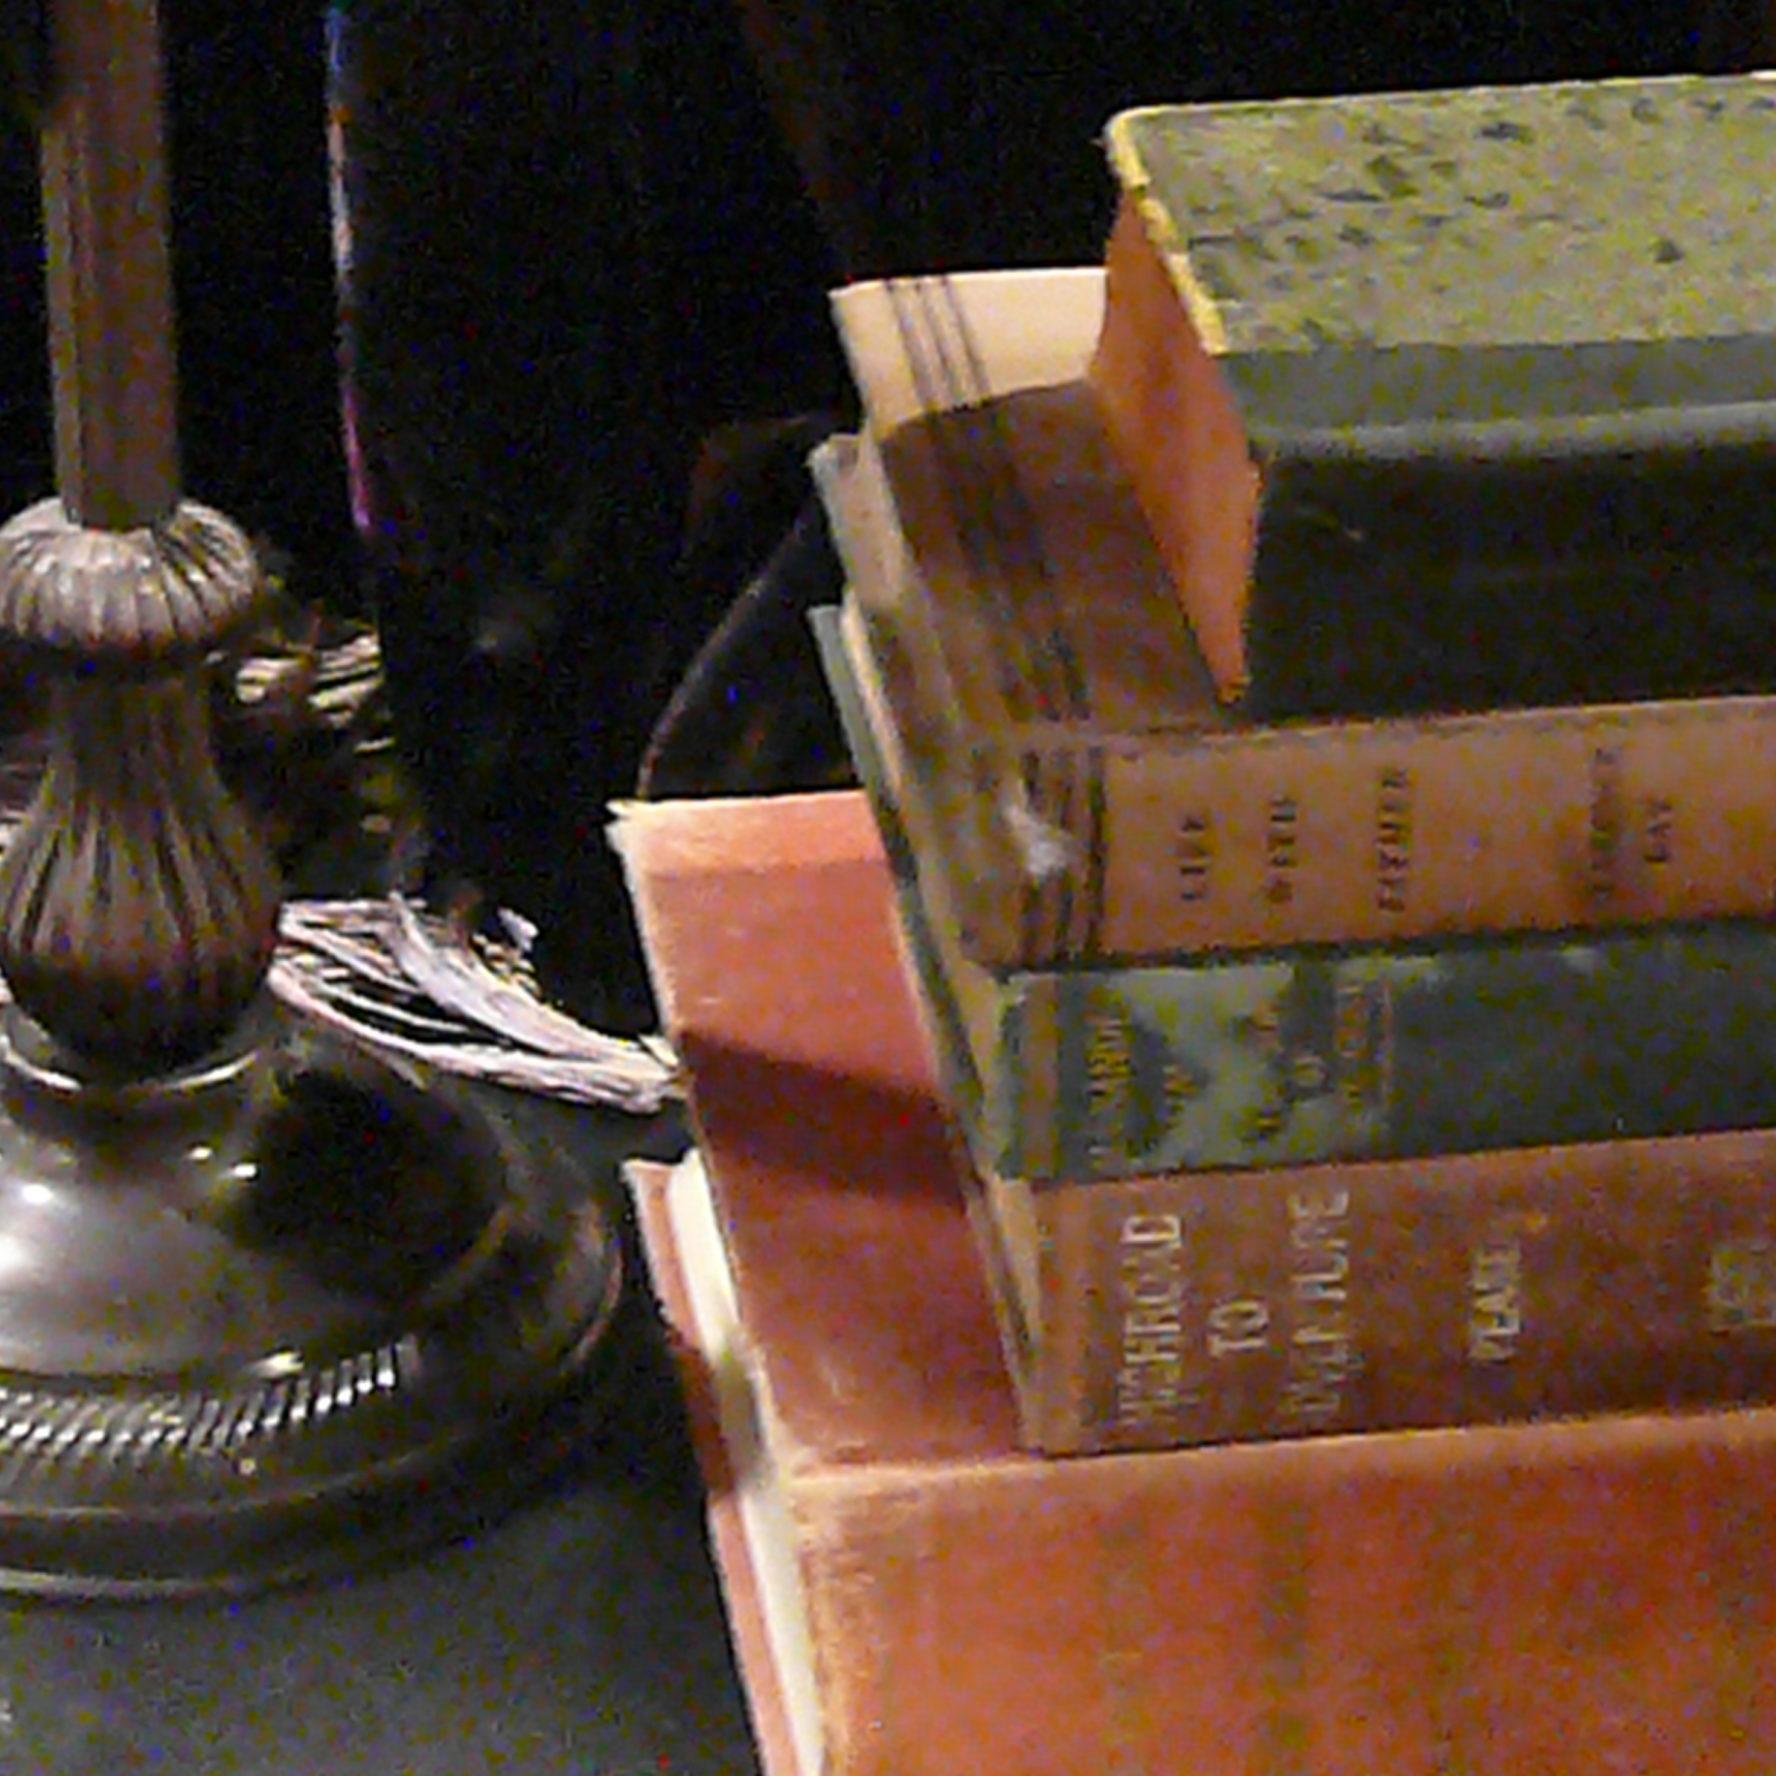 P1160665 closeup lamp & books